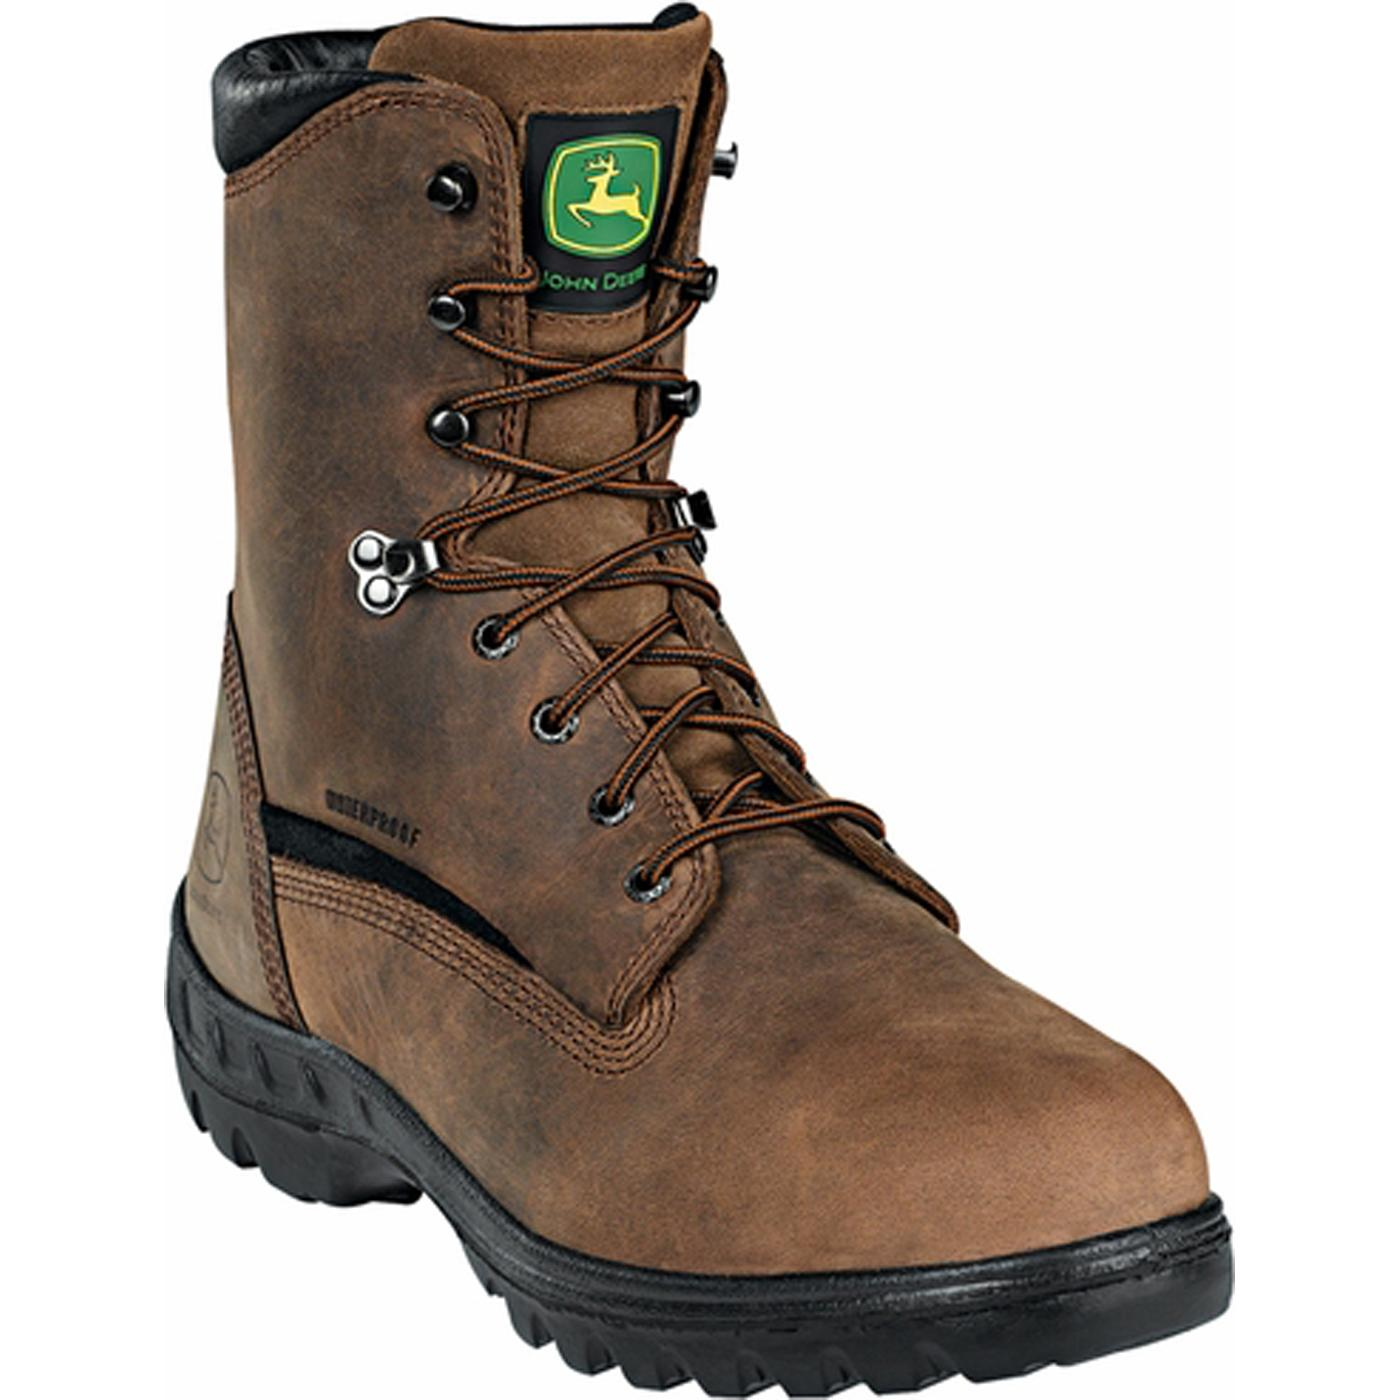 f44ef0d0f02 John Deere Puncture-Resistant Metatarsal Guard Work Boot